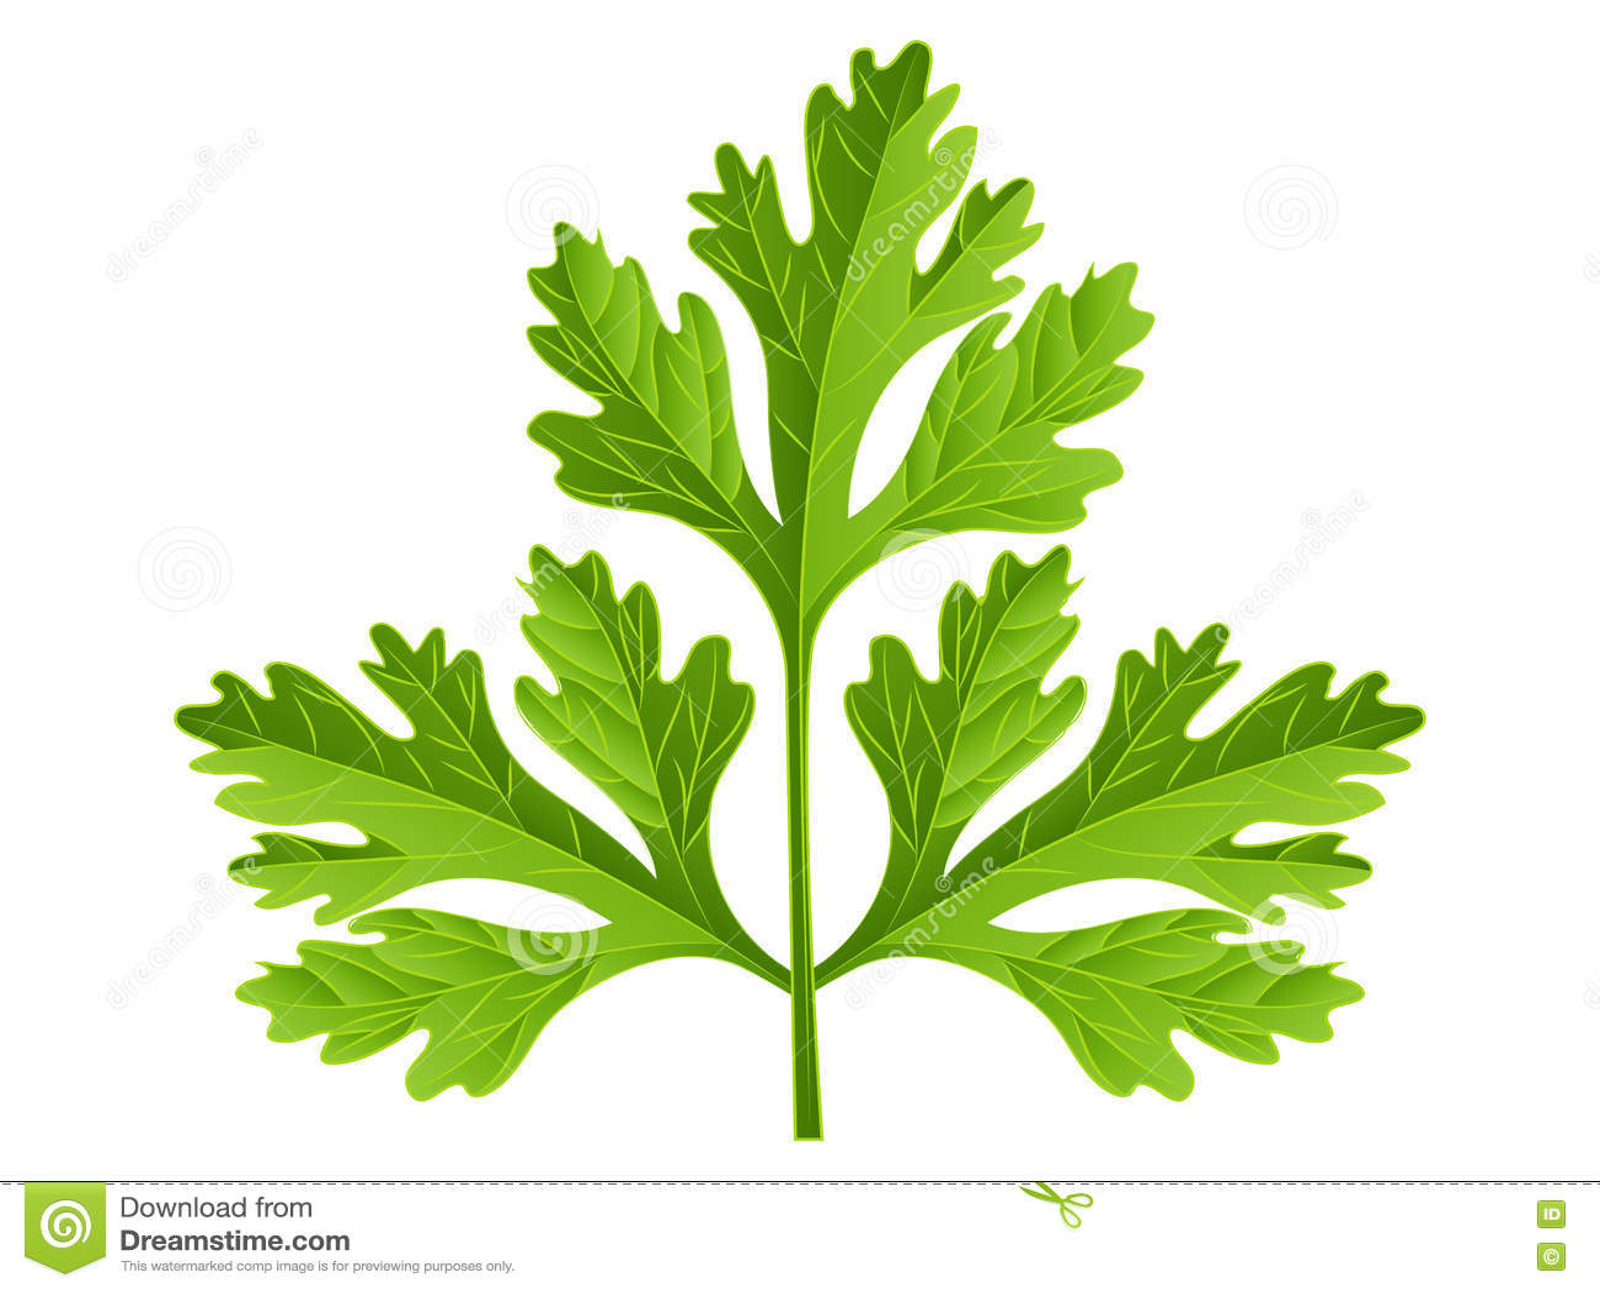 Cartoon Parsley stock vector. Illustration of vegan, healthy - 81447081